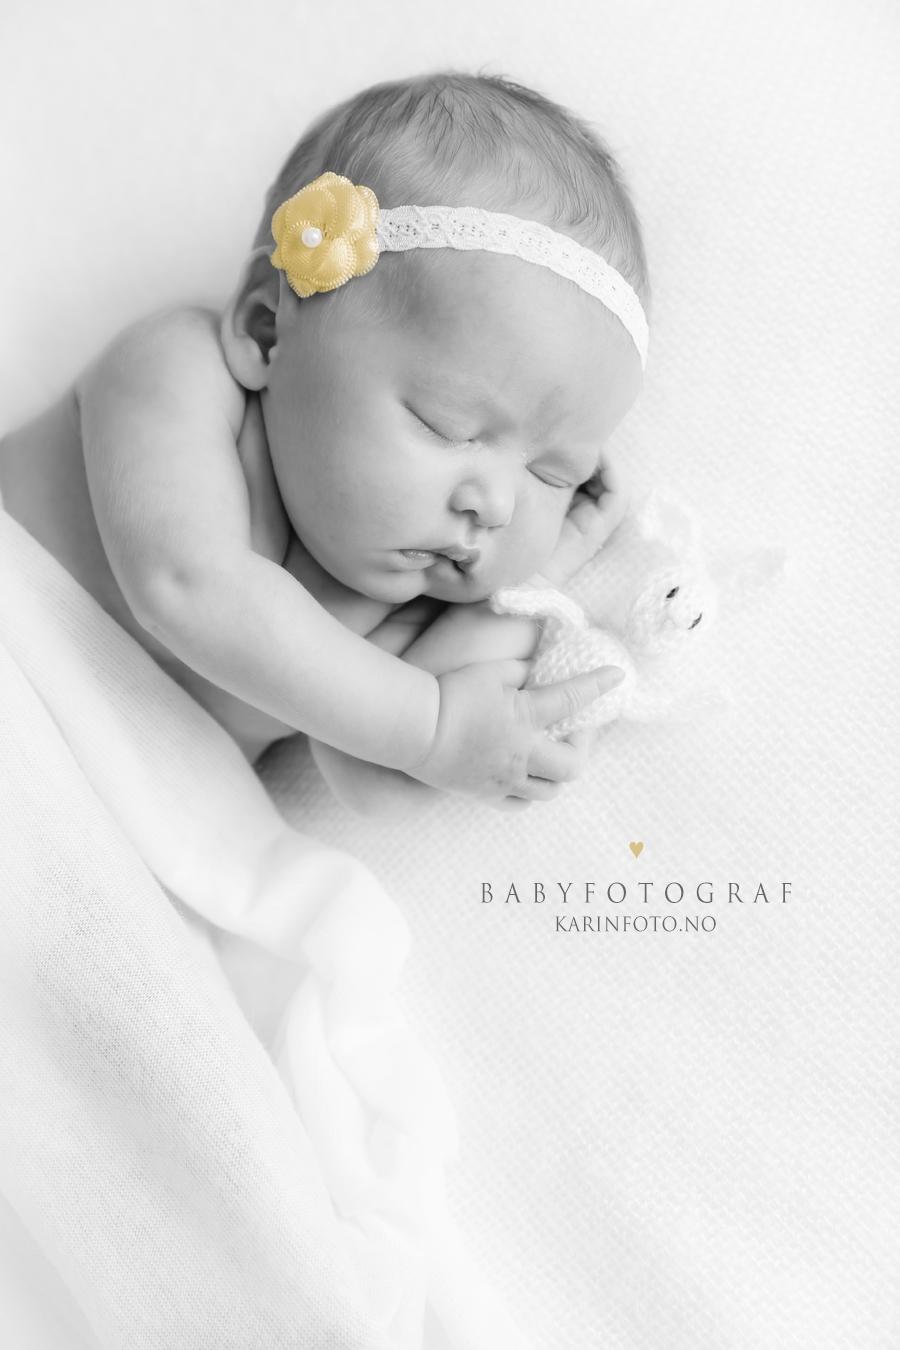 Nyfødtfotograf Karin Pedersen,fotograf,nyfødtfoto,foto,fotografering,sarpsborg,fredrikstad,moss,halden,oslo,kalnes